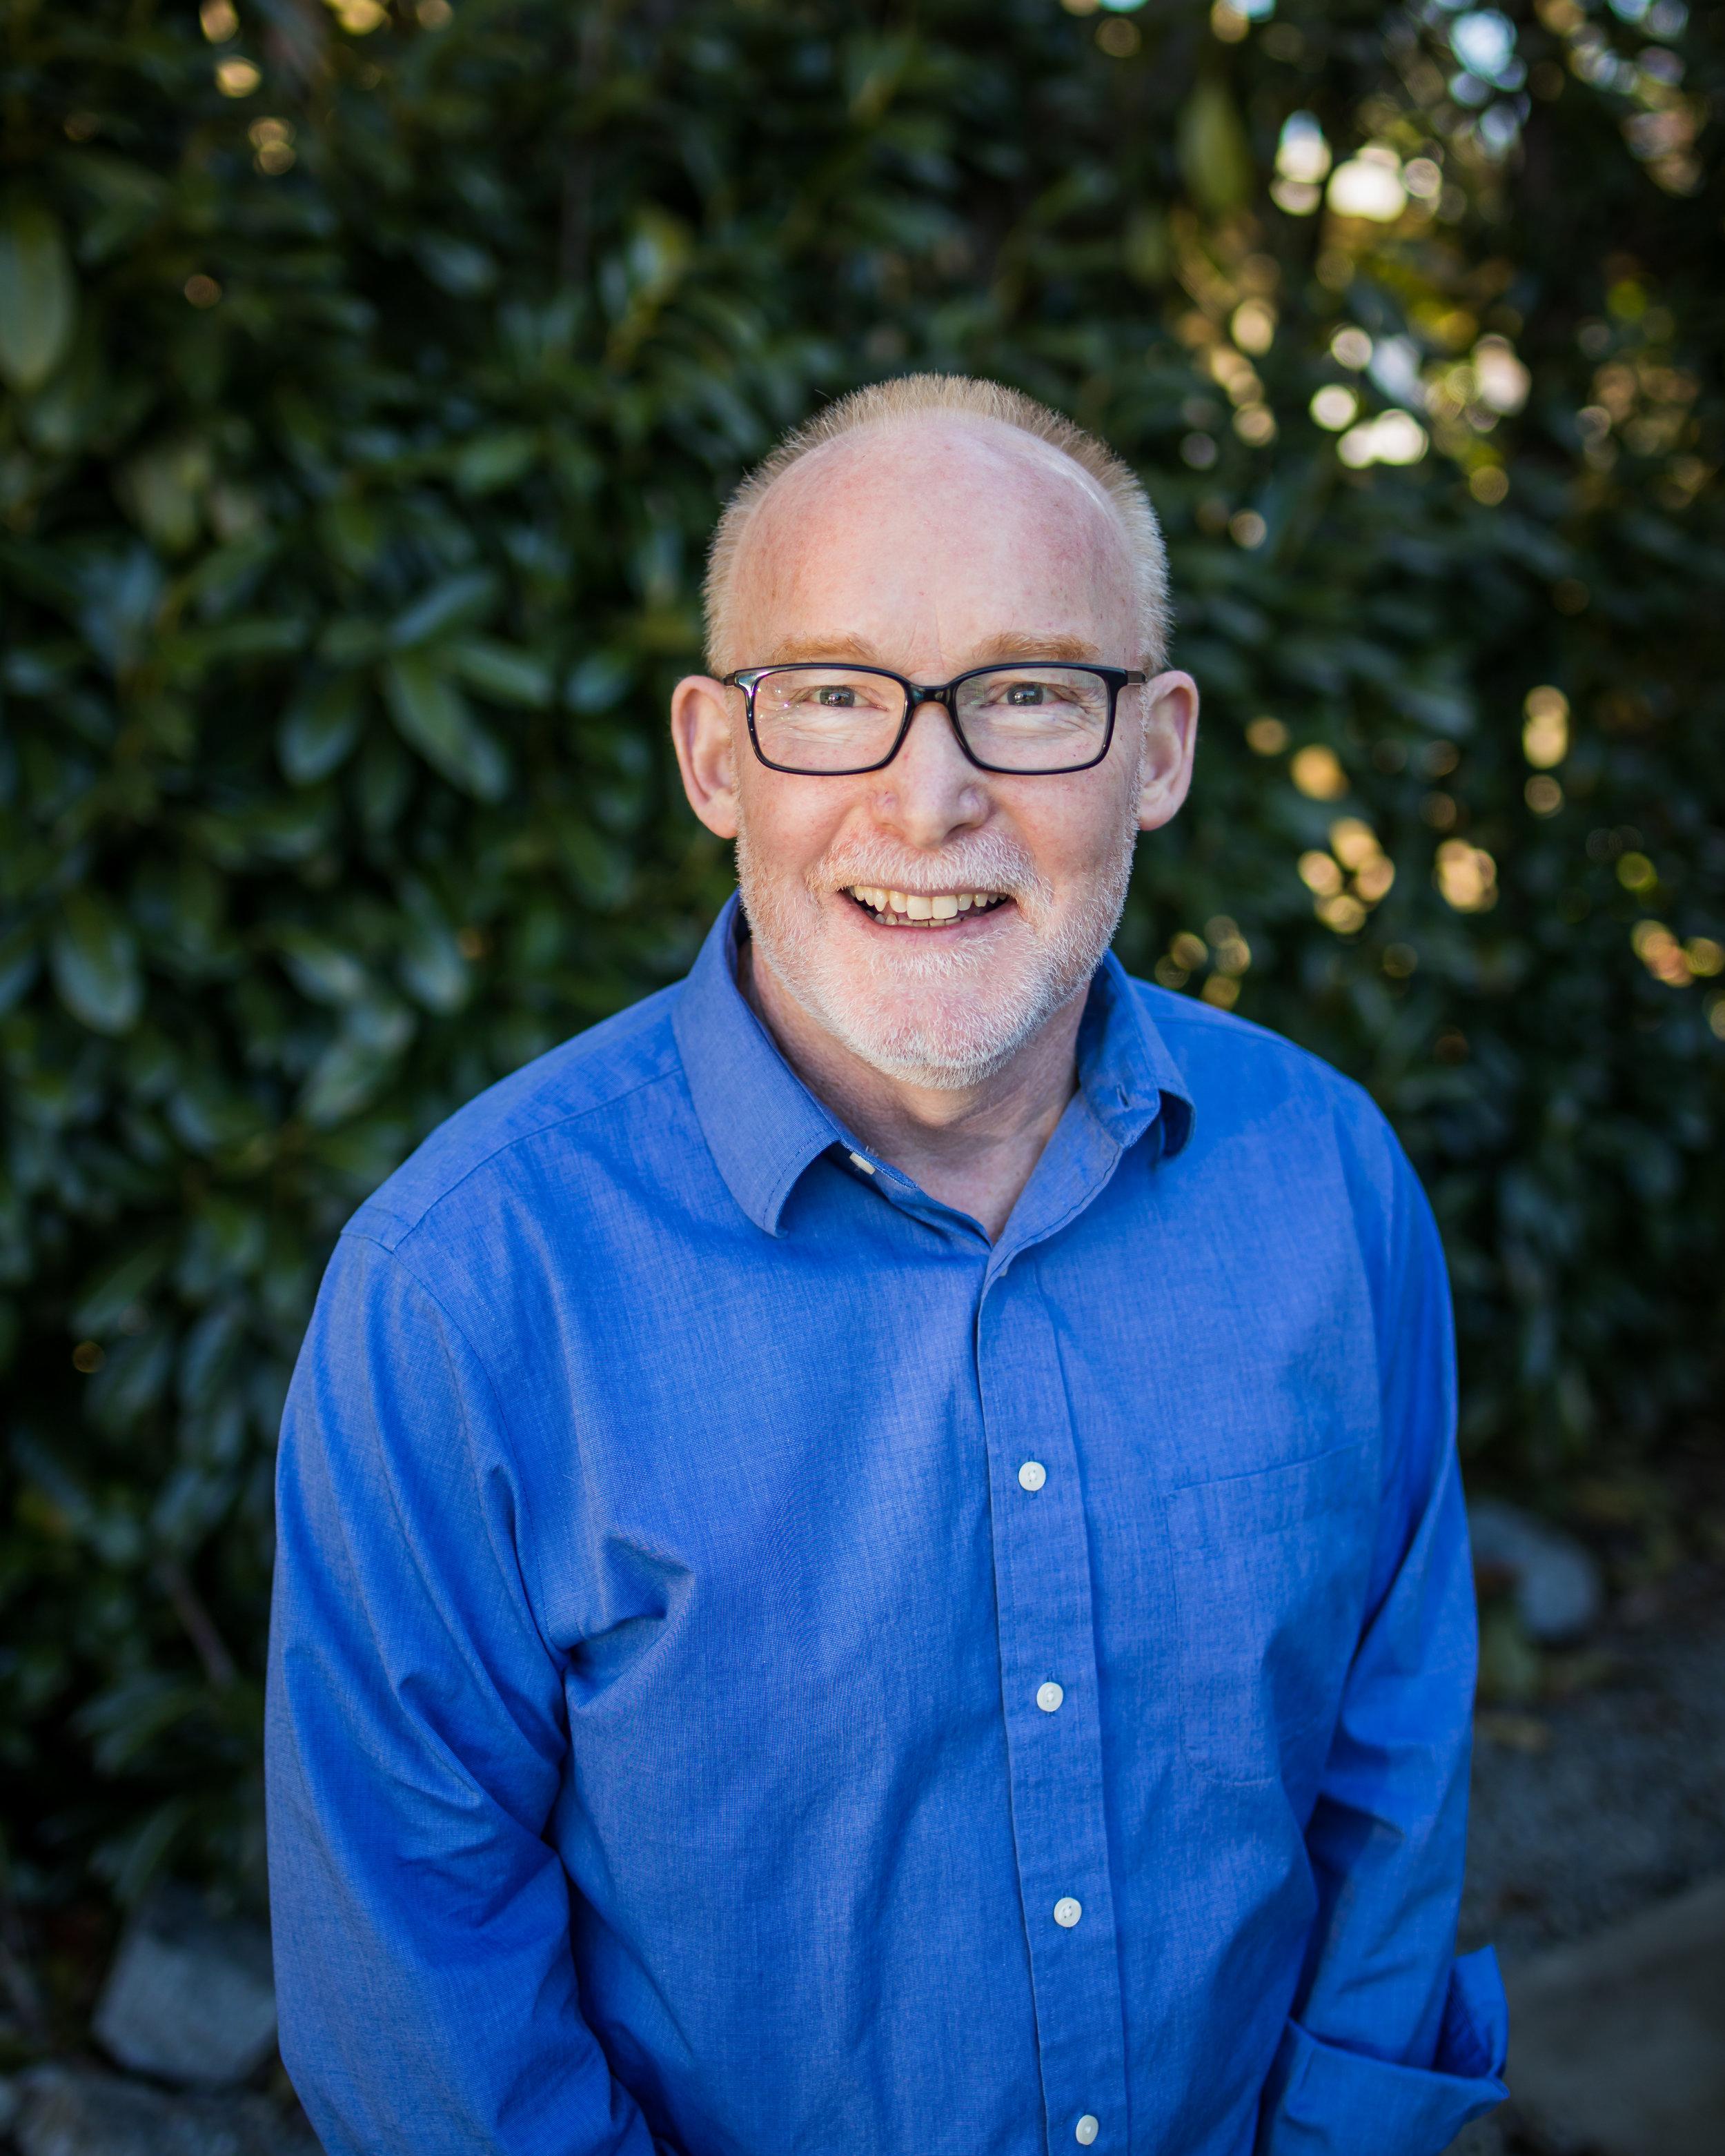 David Horita - Regional Director